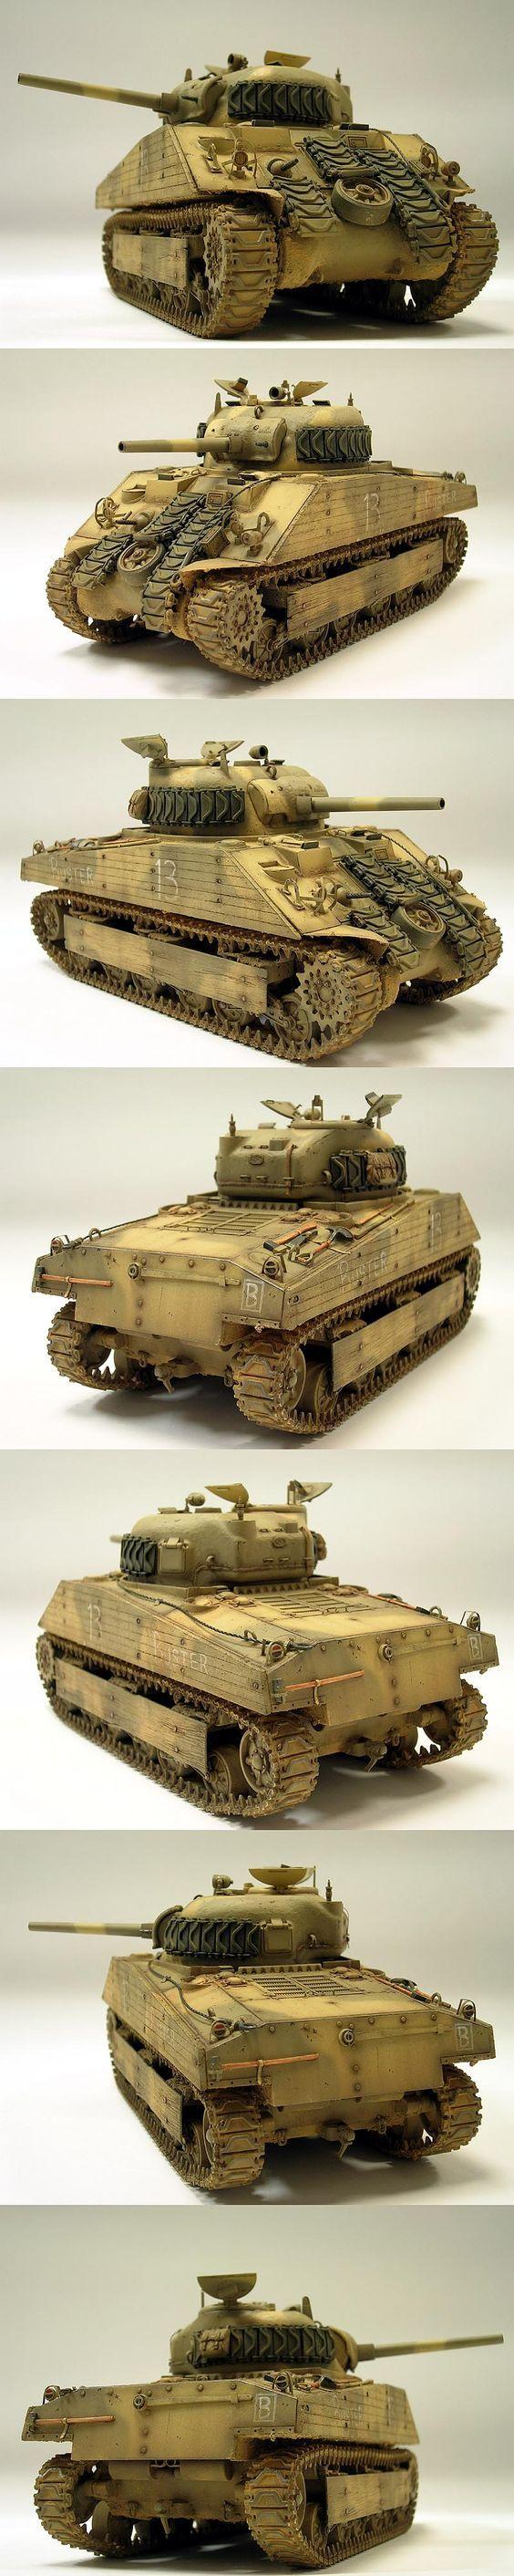 M4A2 Sherman (Early) 1/35 Scale Model USMC Iwo Jima: